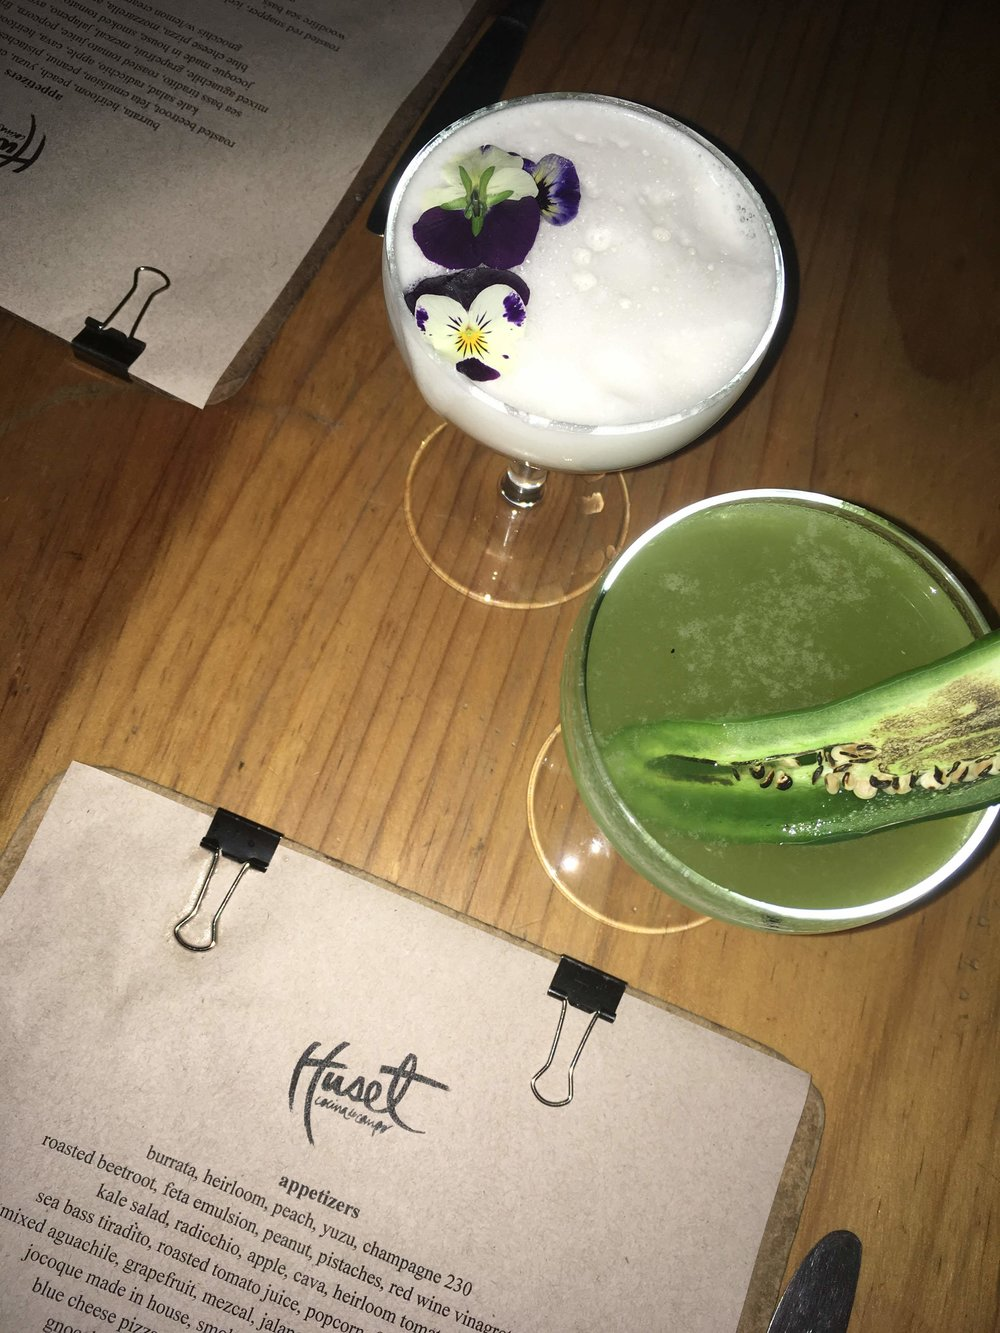 I thoroughly enjoyed my japapeno tequlia cocktail